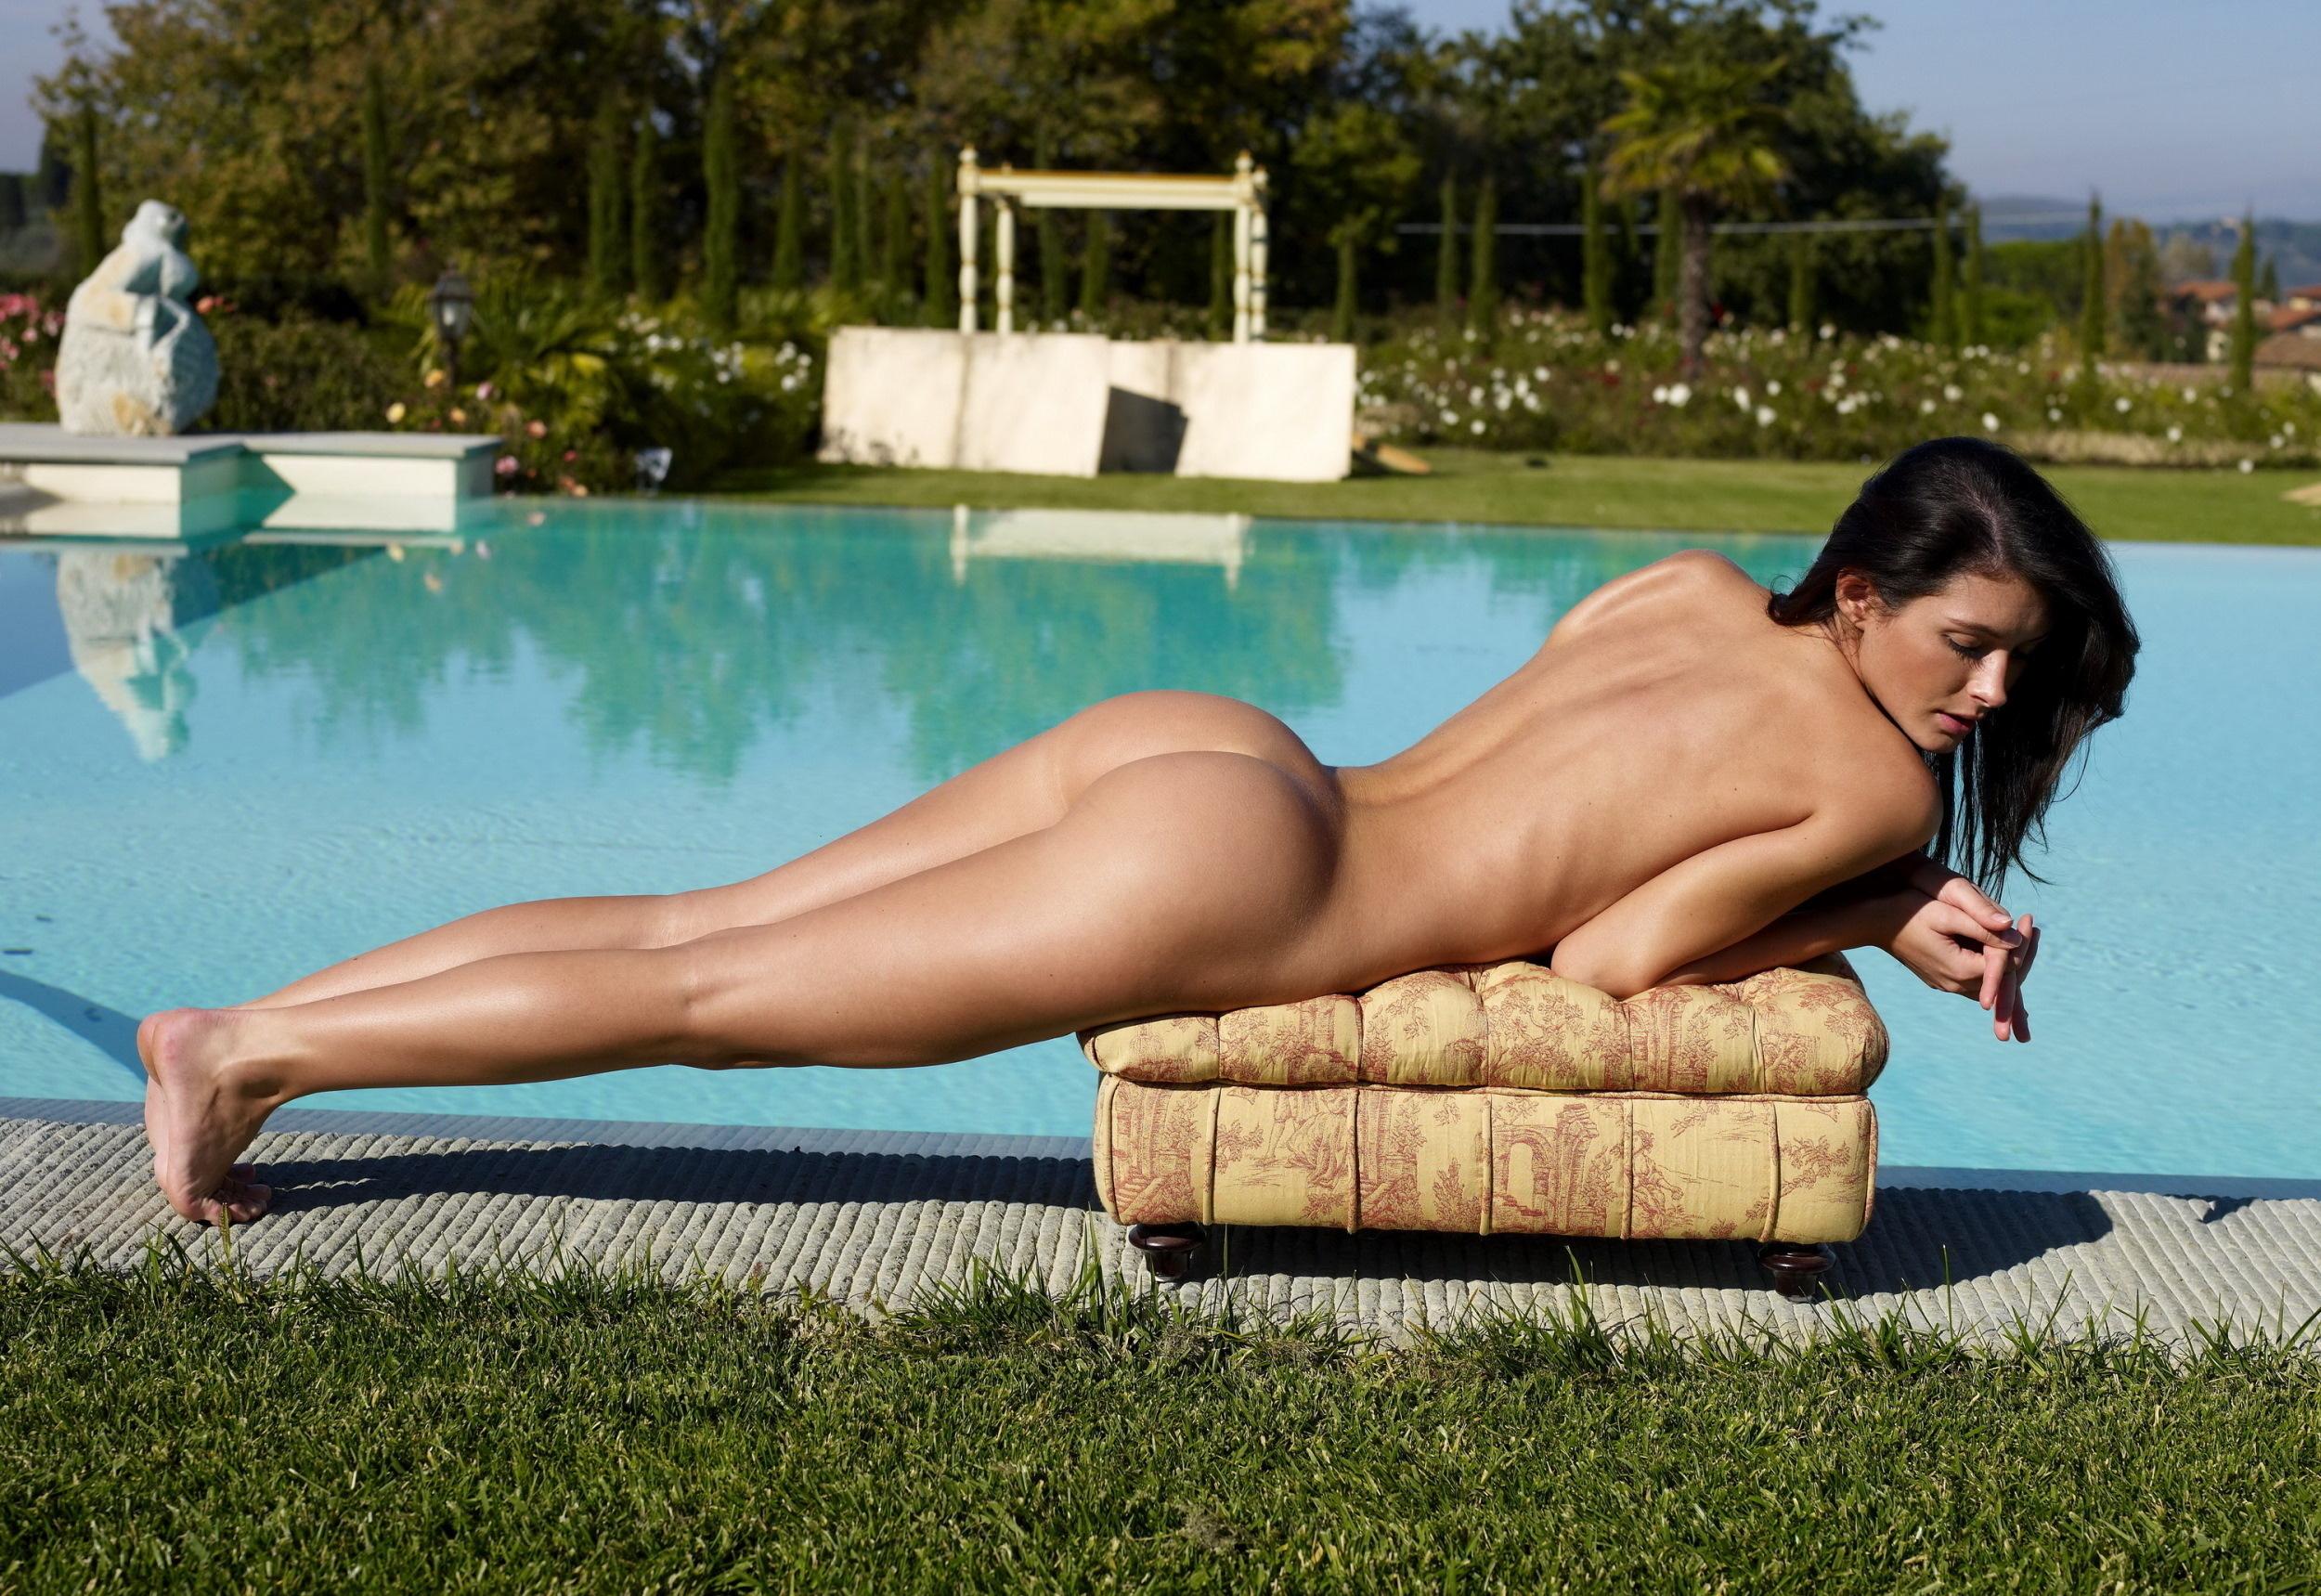 Download 2500x1719 brunette, water, girl, model, pool ...